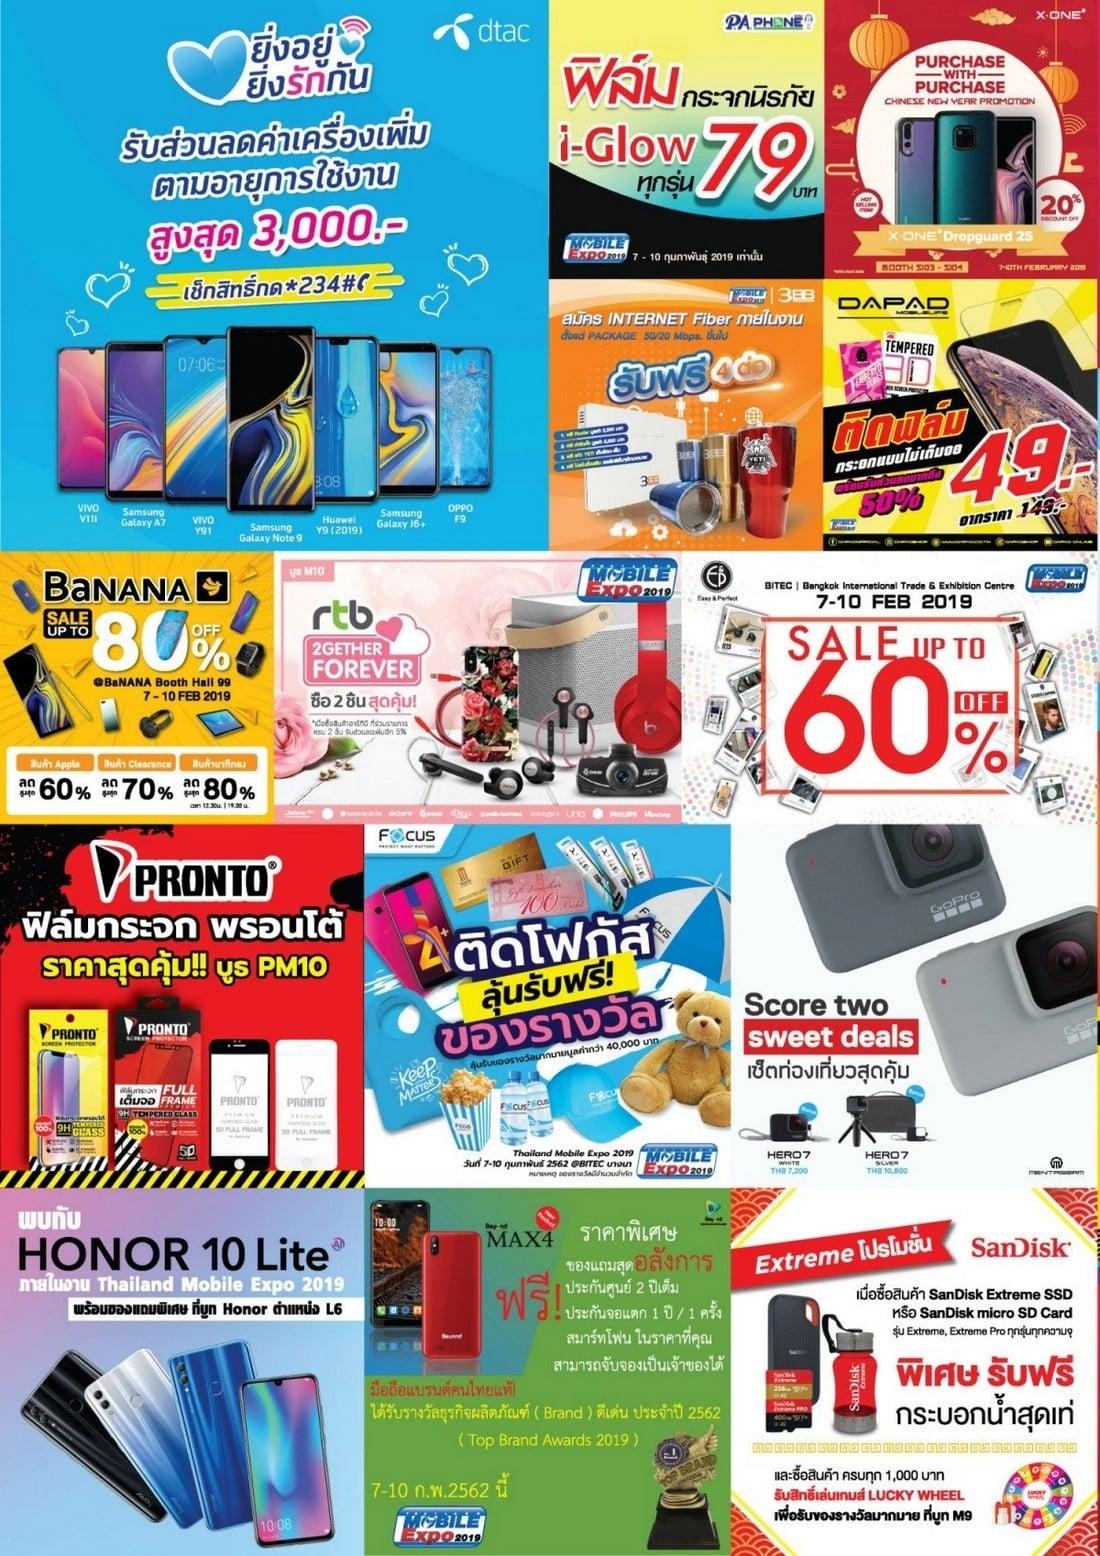 TME 2019 1 Brochure 02 - โบรชัวร์งาน Thailand Mobile Expo 2019 ที่จะจัดขึ้นวันที่ 7-10กุมภาพันธ์นี้ ที่ไบเทค บางนา